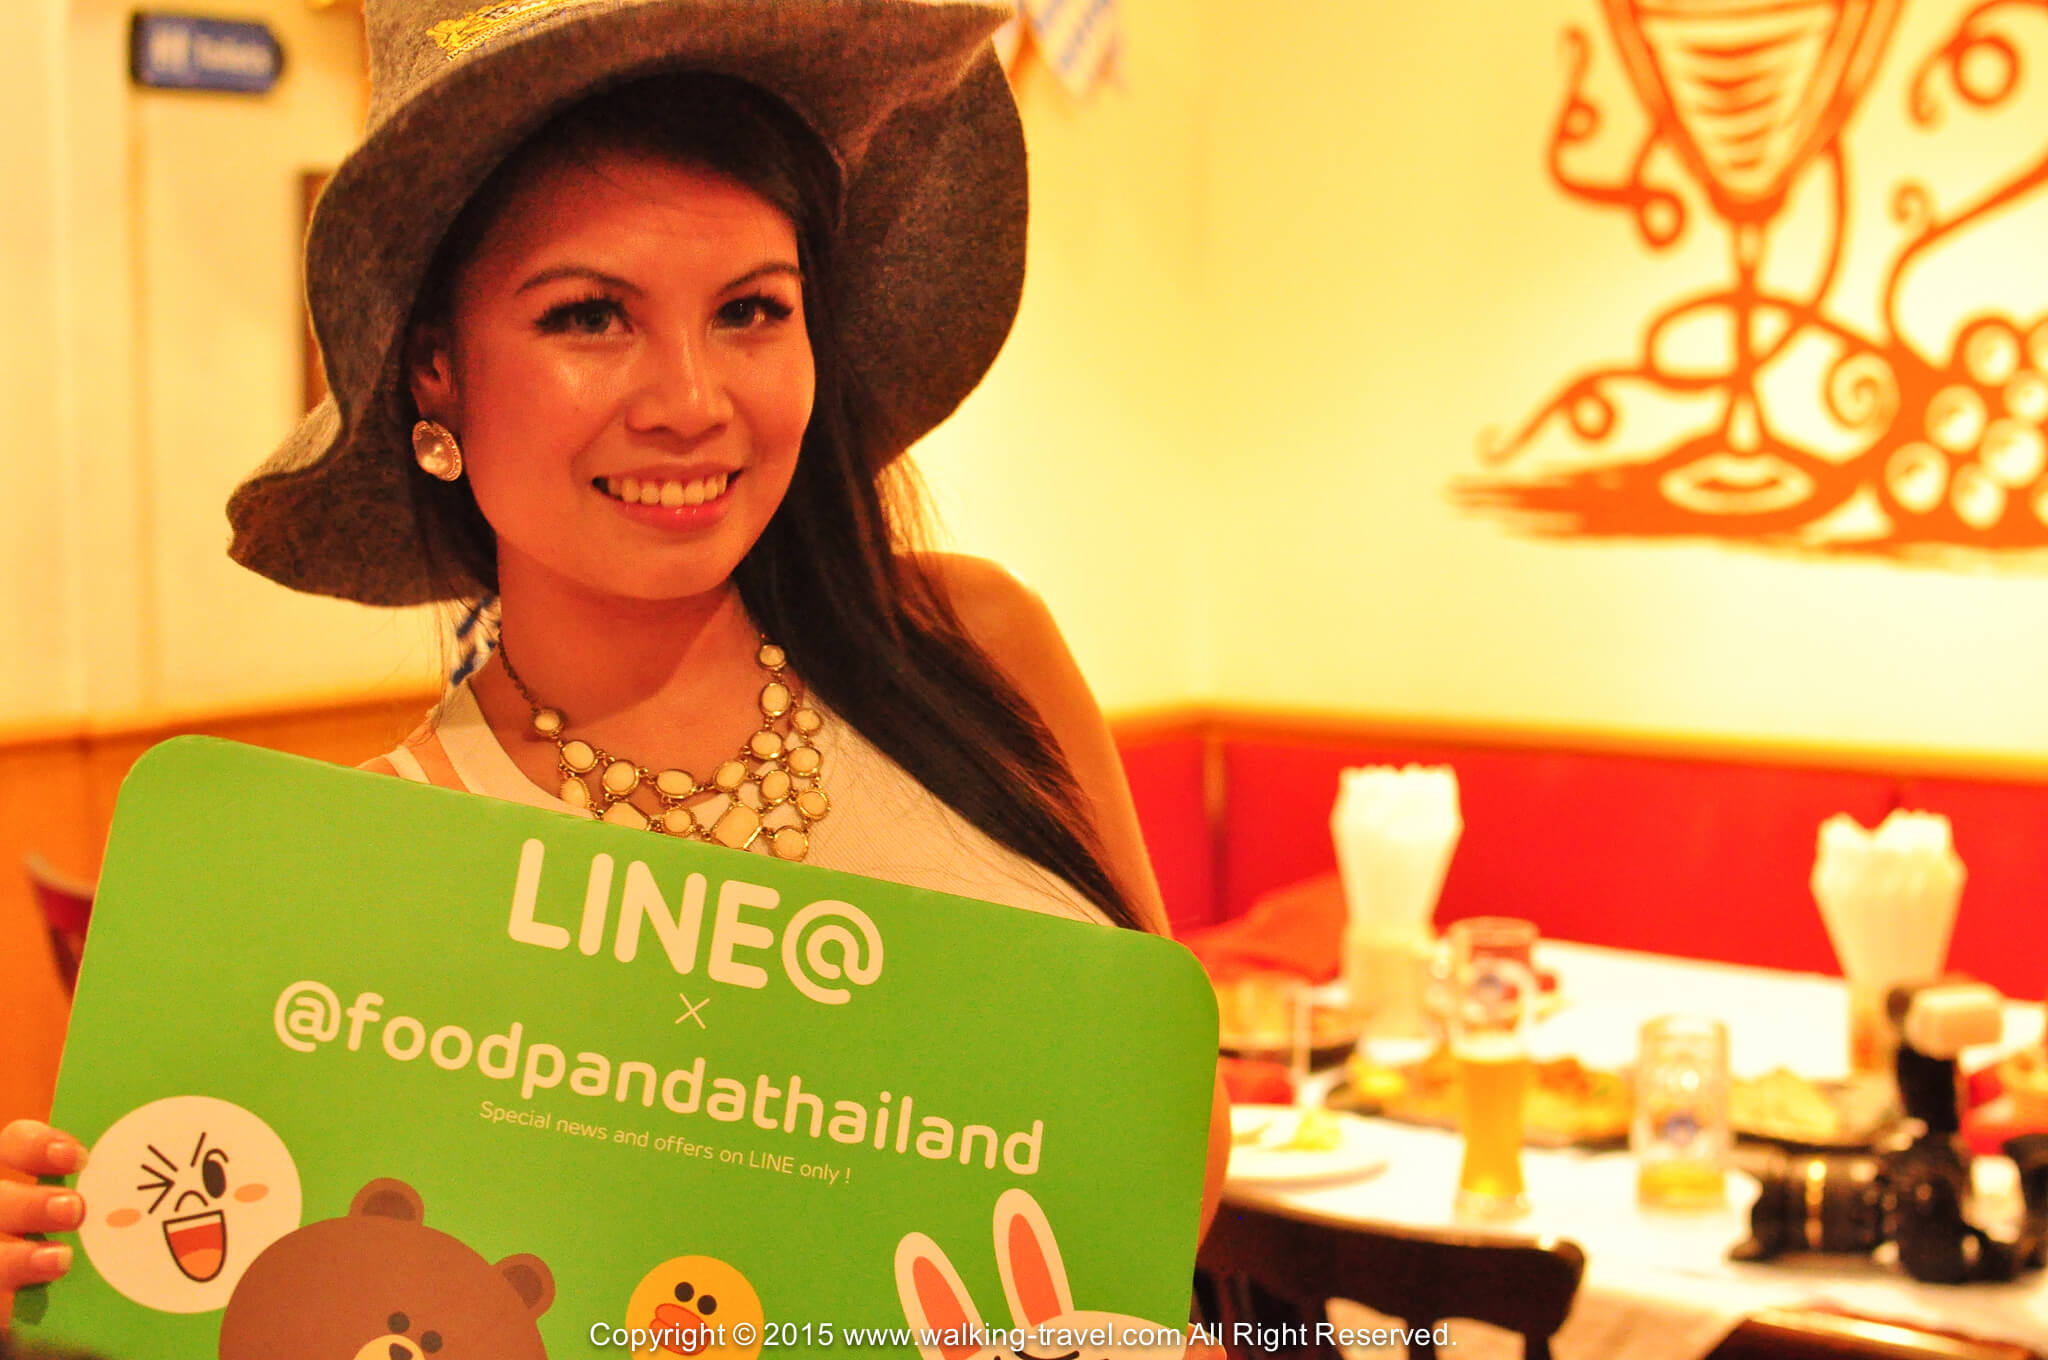 line @foodpanda